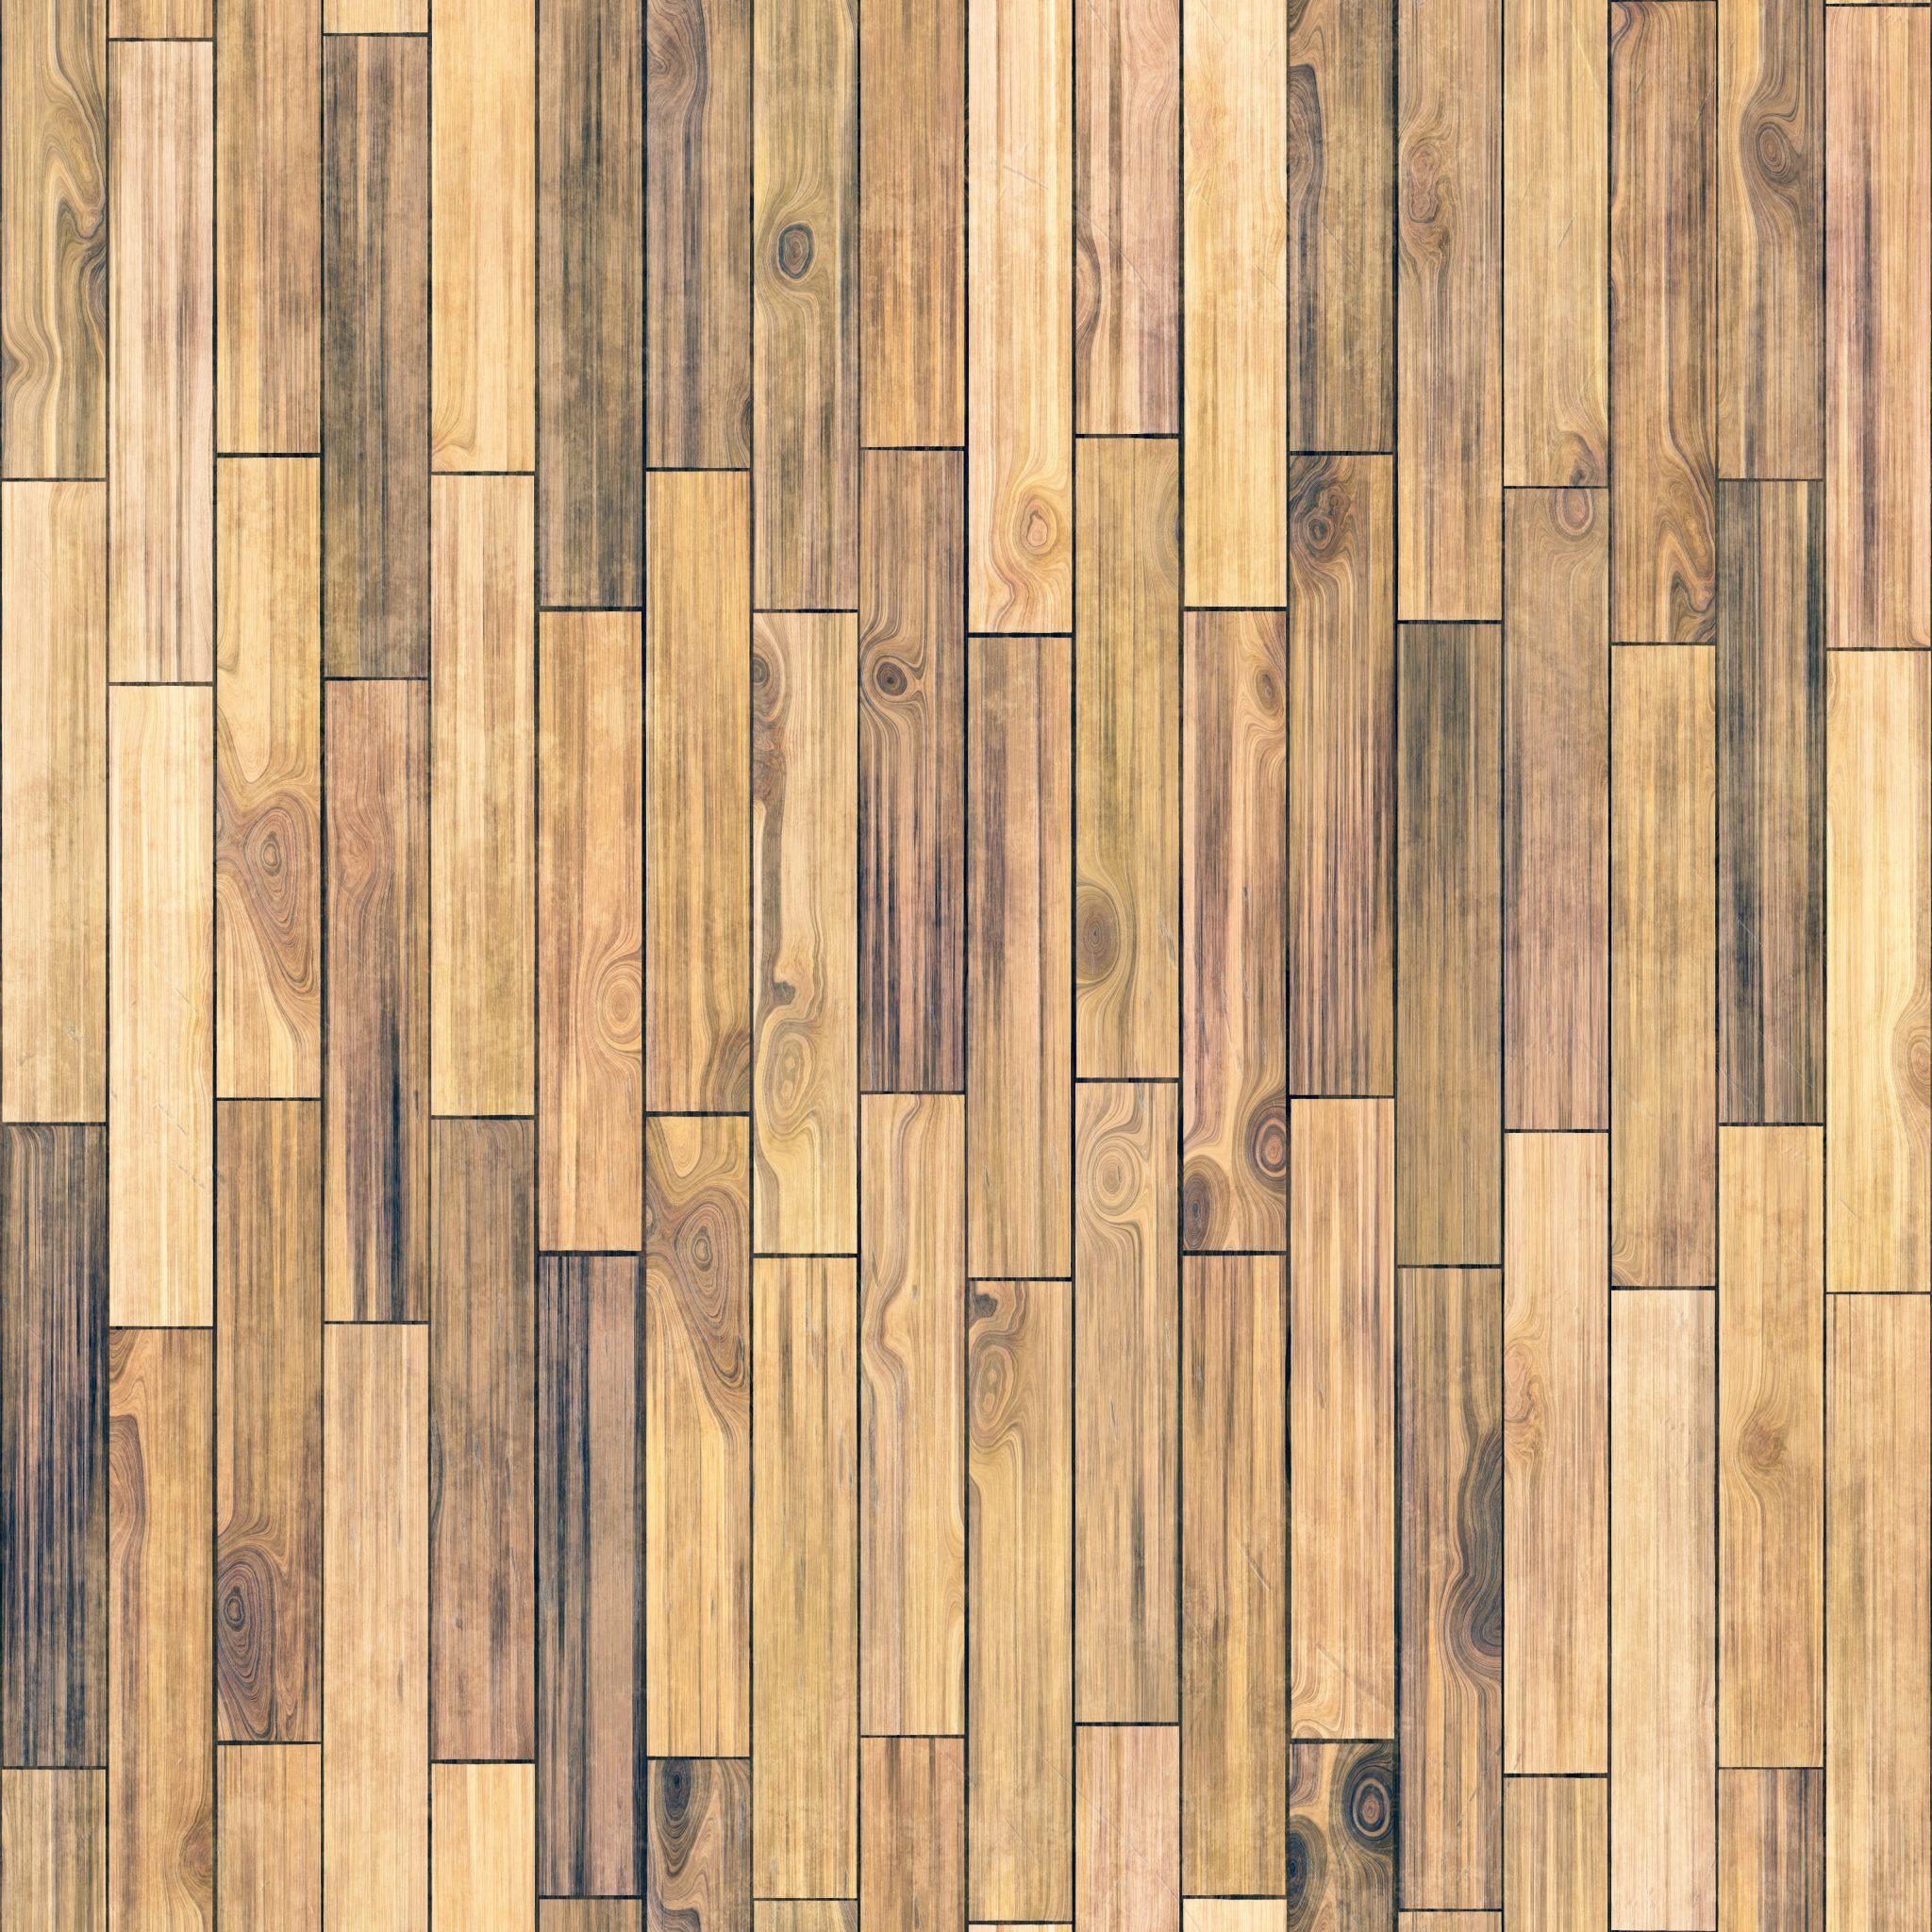 Seamless Light Brown Vertical Laminate Parquet Wood Grain